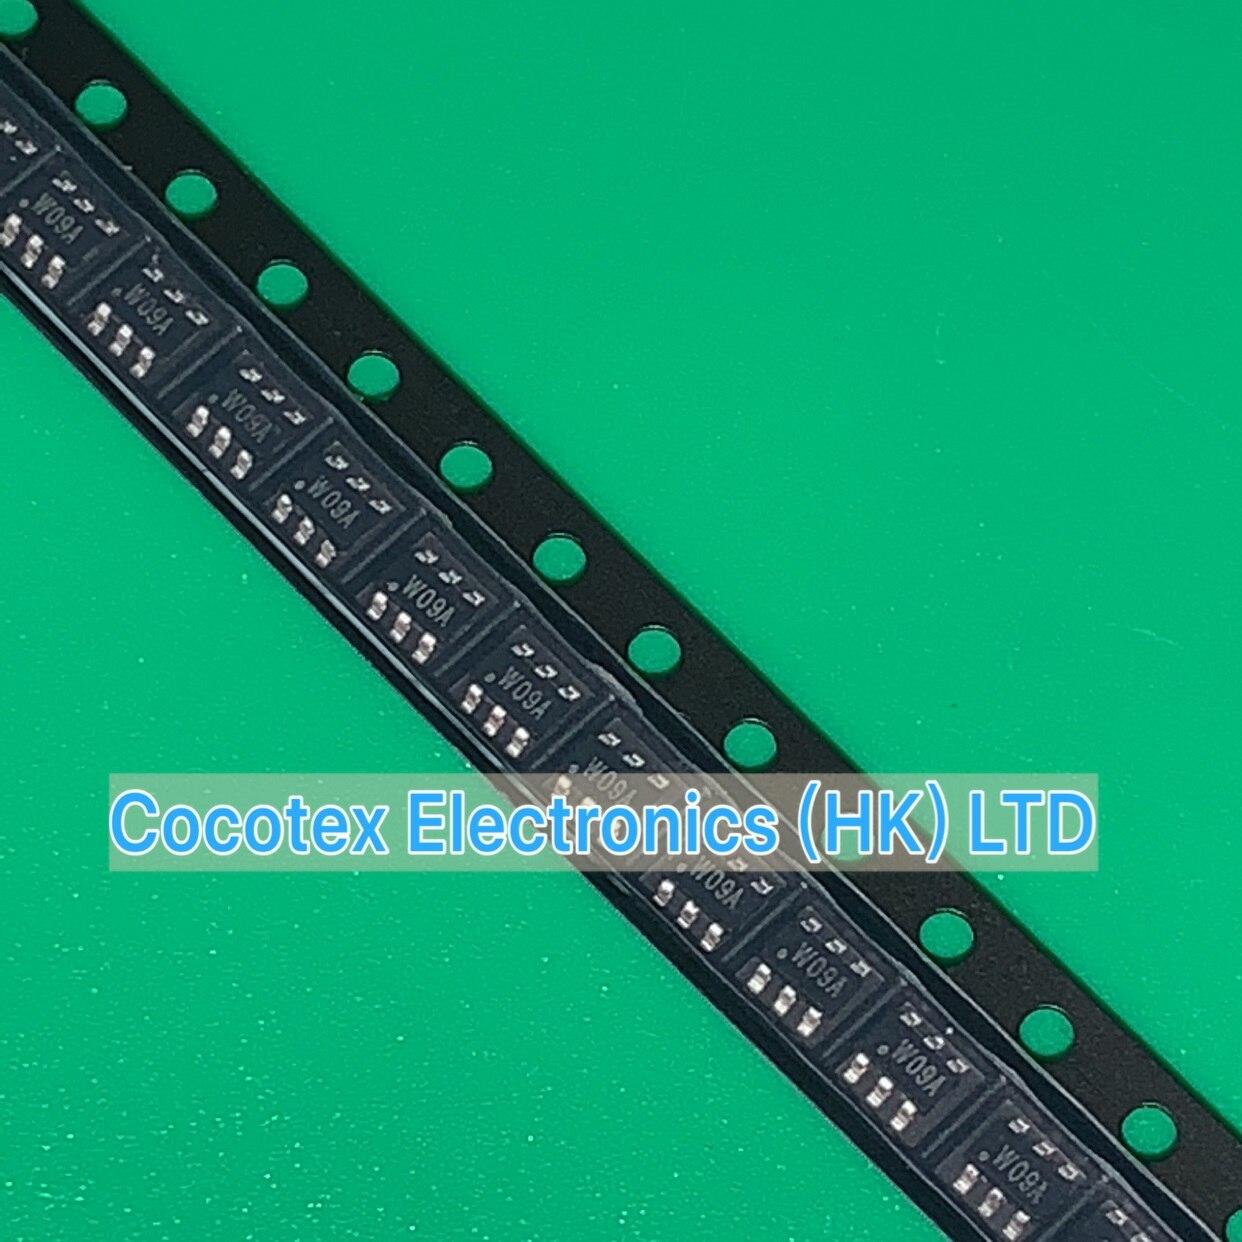 30 unids/lote APW7209CI-TRG SOT23-6 W09C W09 1MHZ de alta eficiencia-Convertidor de 2 a 10 blanco LEDS